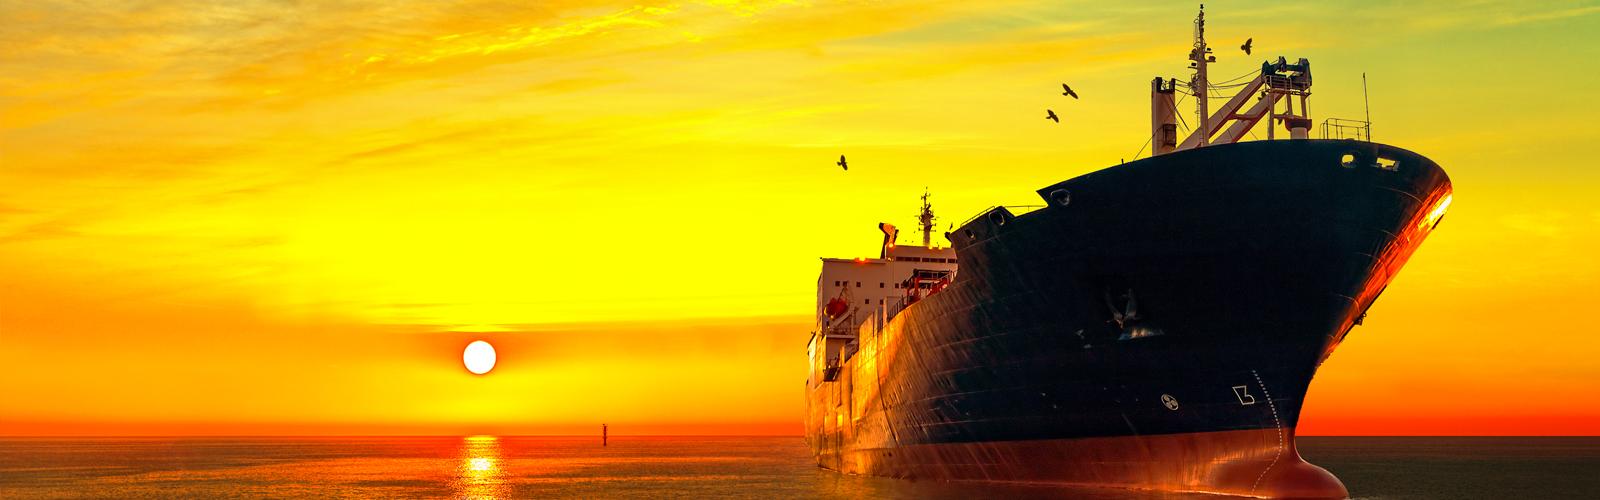 shipping-MACN